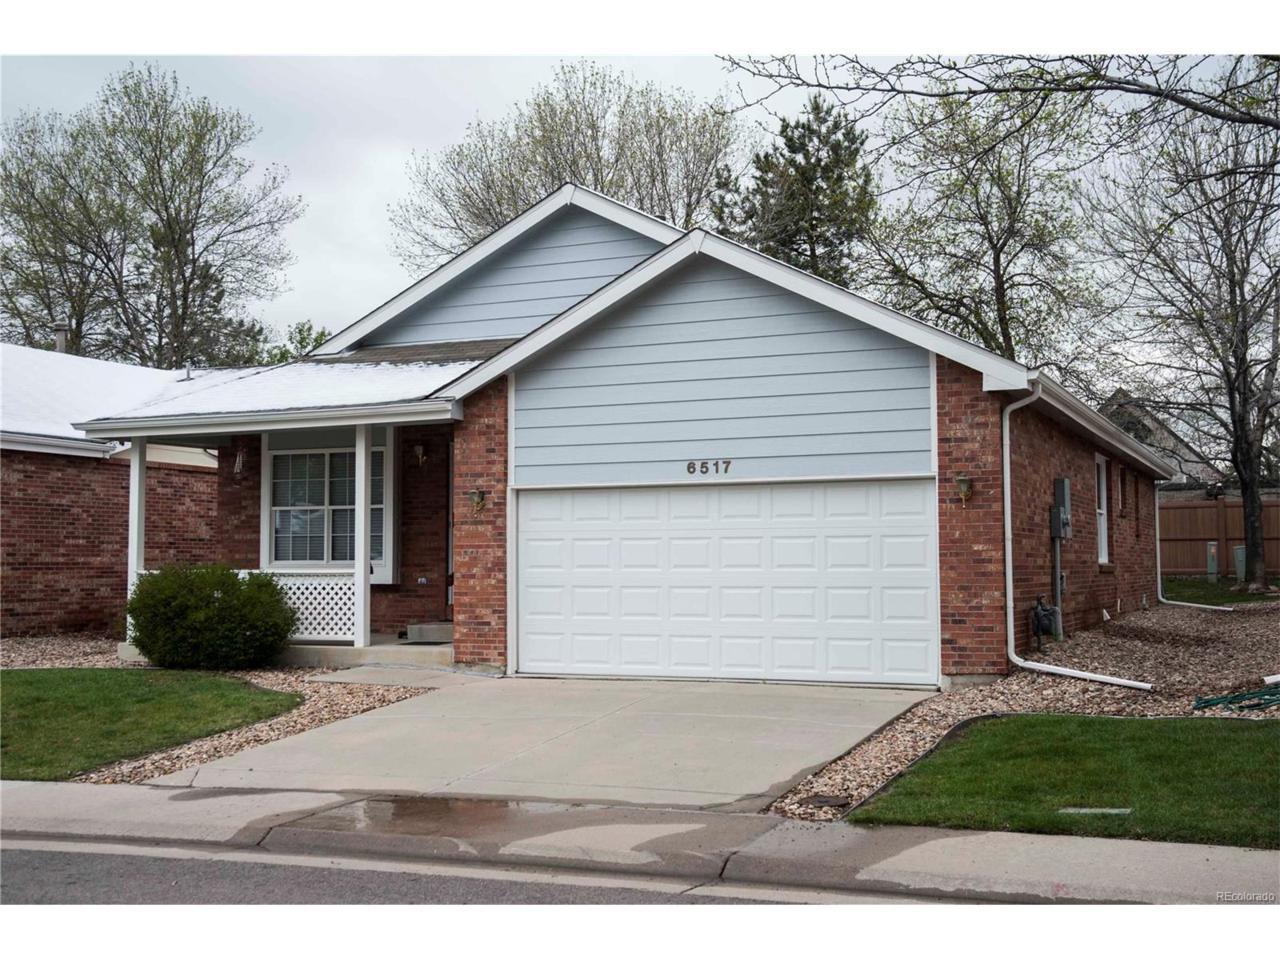 6517 Pierson Street, Arvada, CO 80004 (MLS #4246361) :: 8z Real Estate